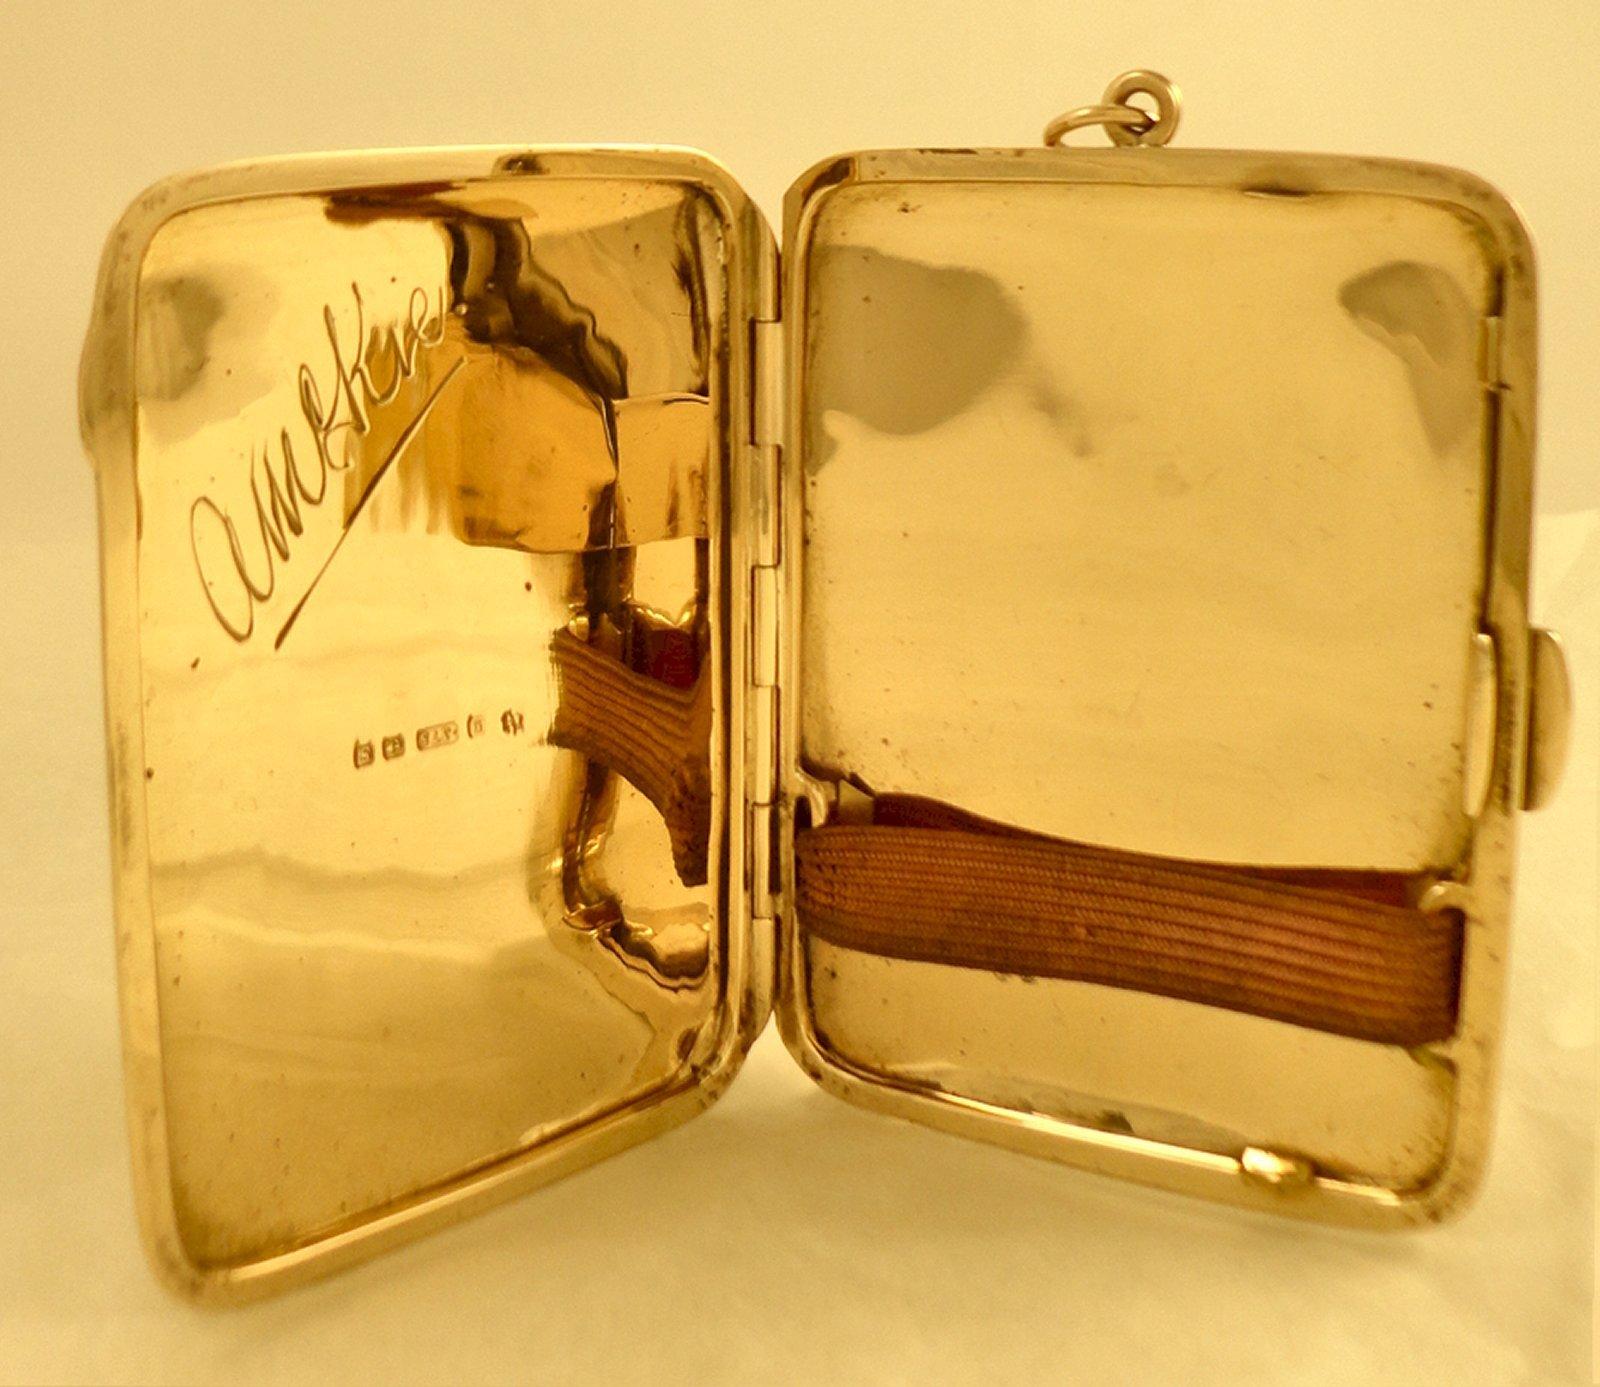 Italian Gold Chain >> VINTAGE 9CT SOLID GOLD HALLMARKED CIGARETTE or CARD CASE   Ian Burton Antique Clocks